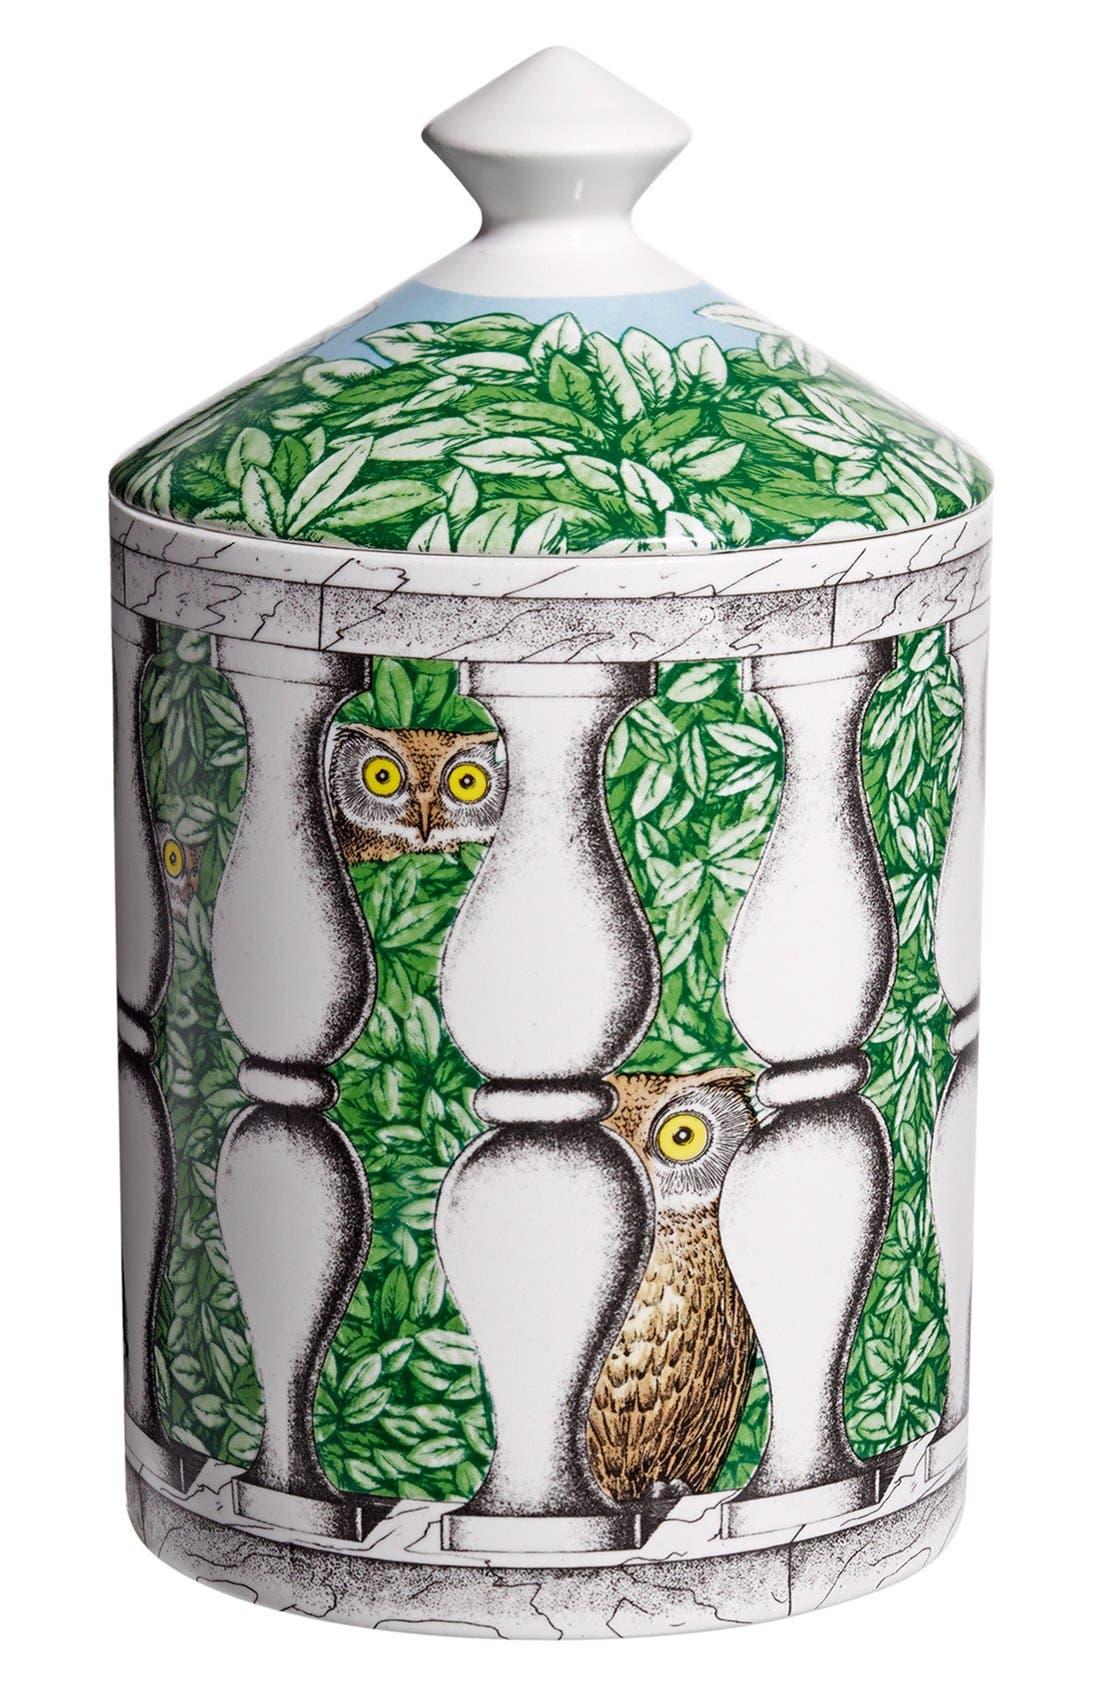 'Balaustra - Segretto' Lidded Candle,                         Main,                         color, 000